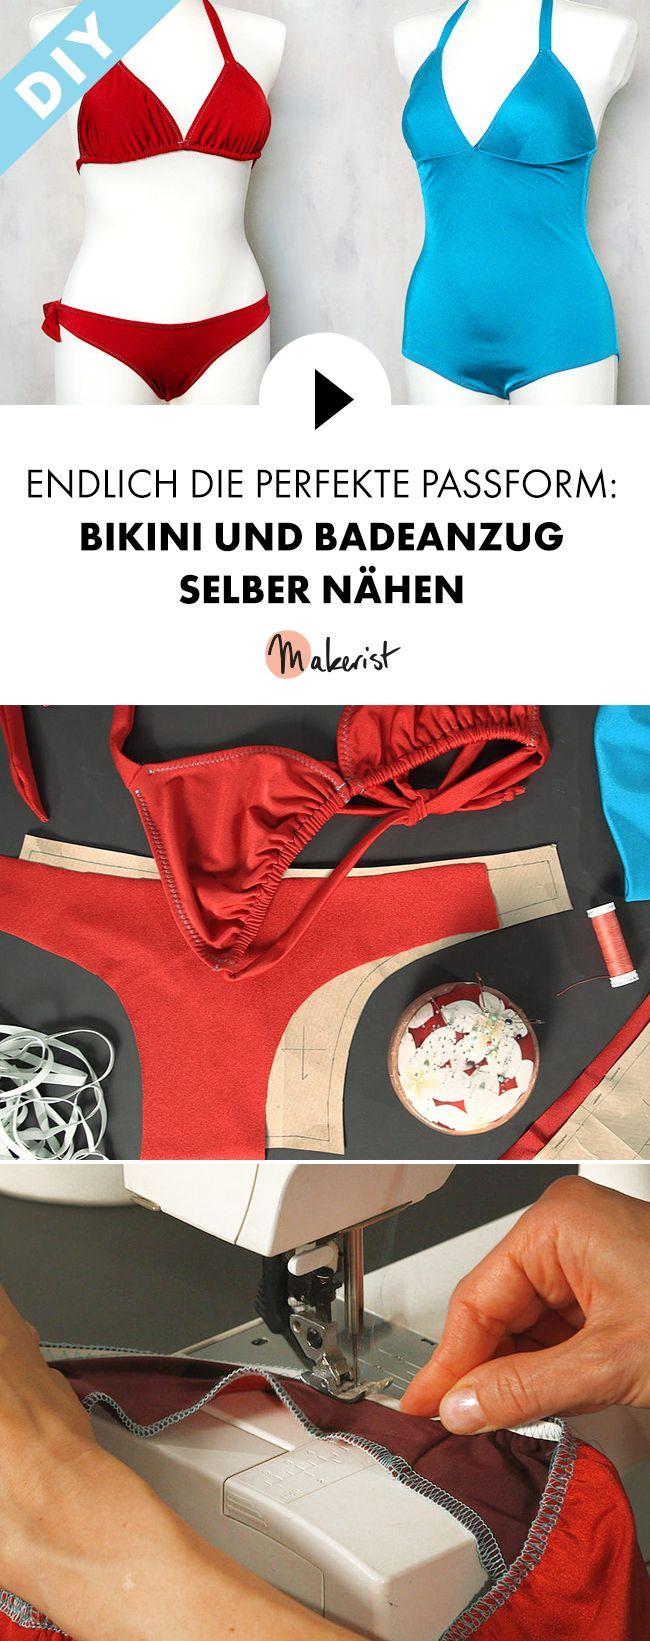 Bademode DIY: Bikini und Badeanzug selber nähen - Schritt für Schritt erklärt im Video-Kurs via Makerist.de